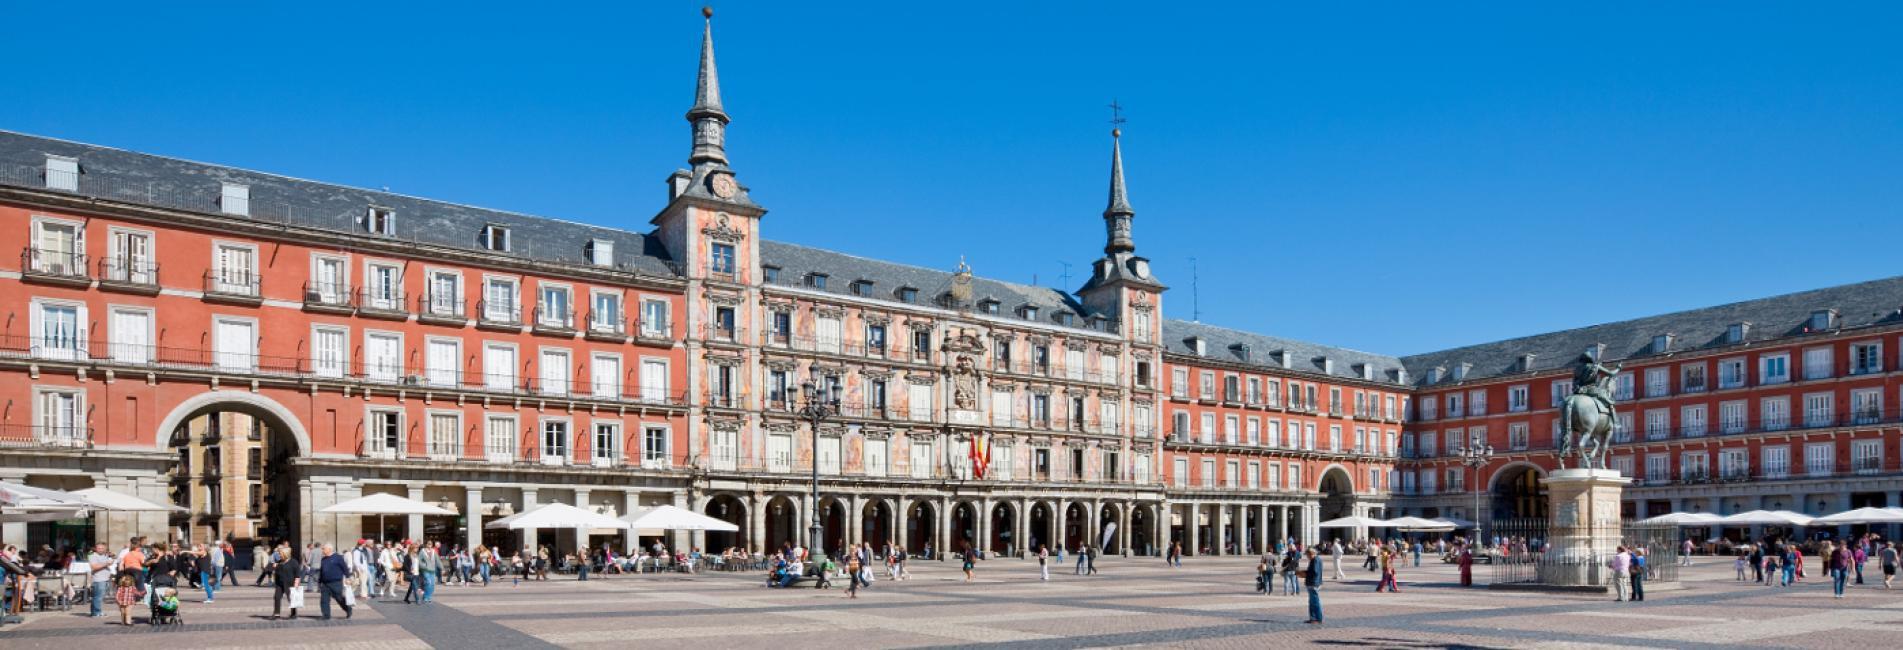 IWMbD2017 in Madrid, Spain, December 14-15 2017